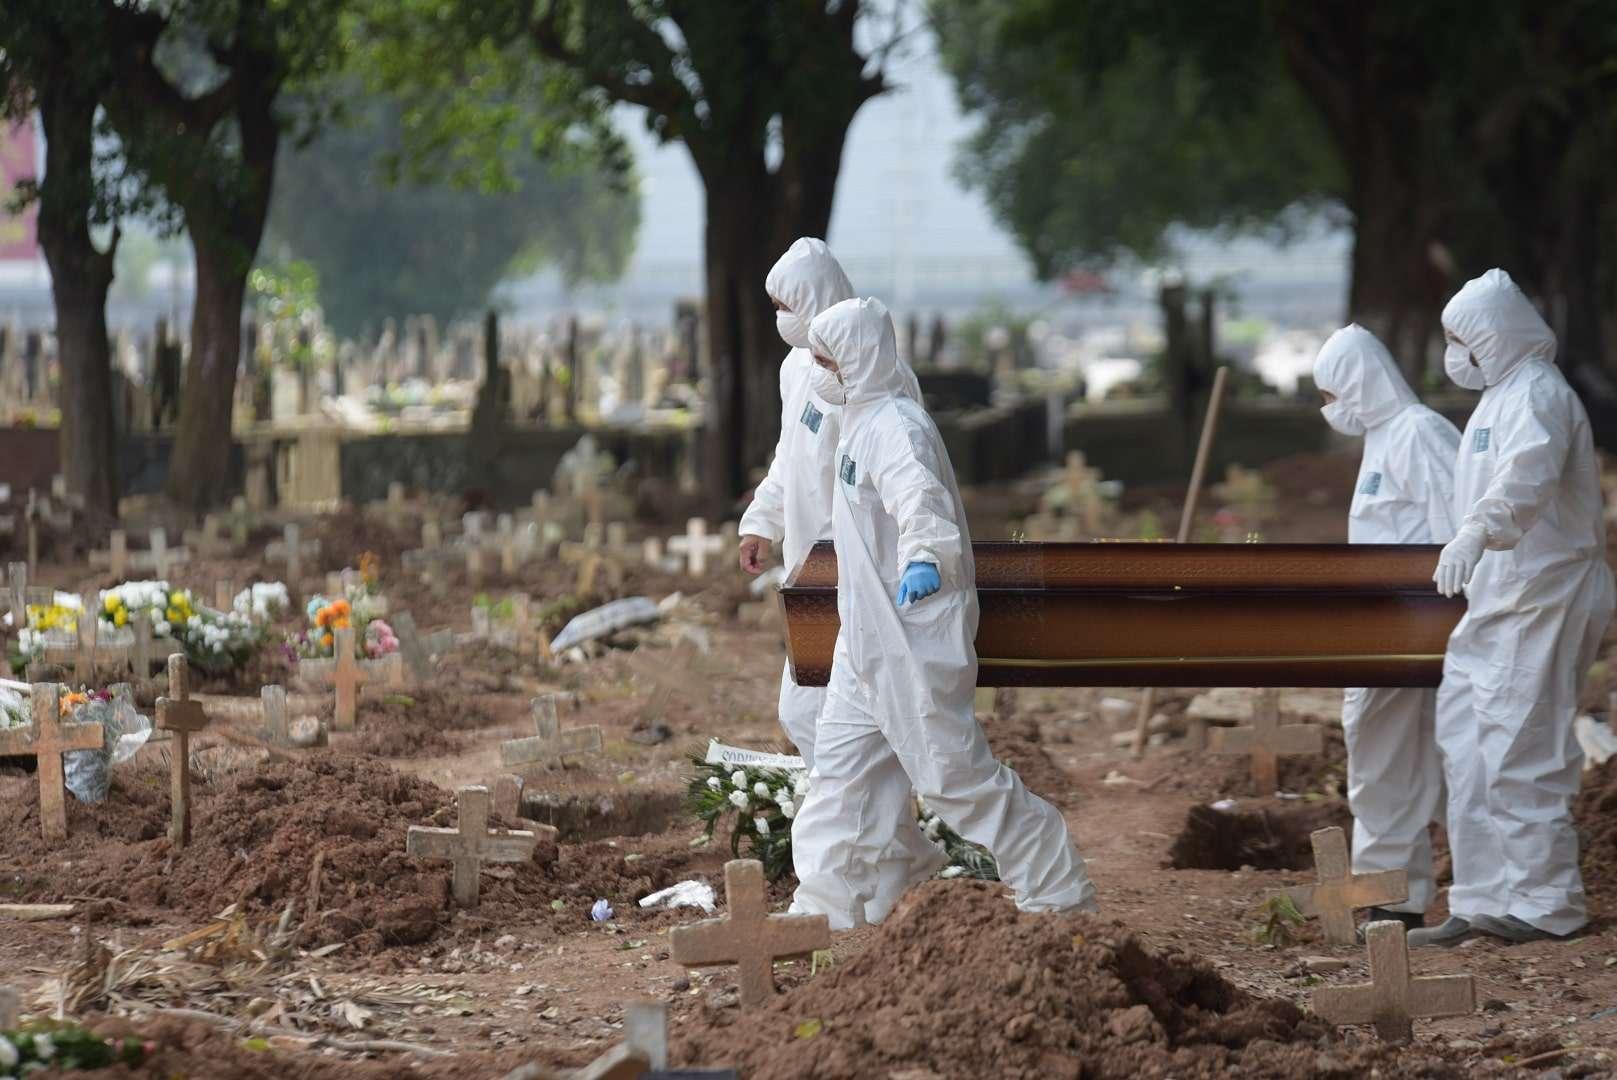 Covid-19: Brasil tem 1.386 mortes nas últimas 24h; total ultrapassa 254 mil